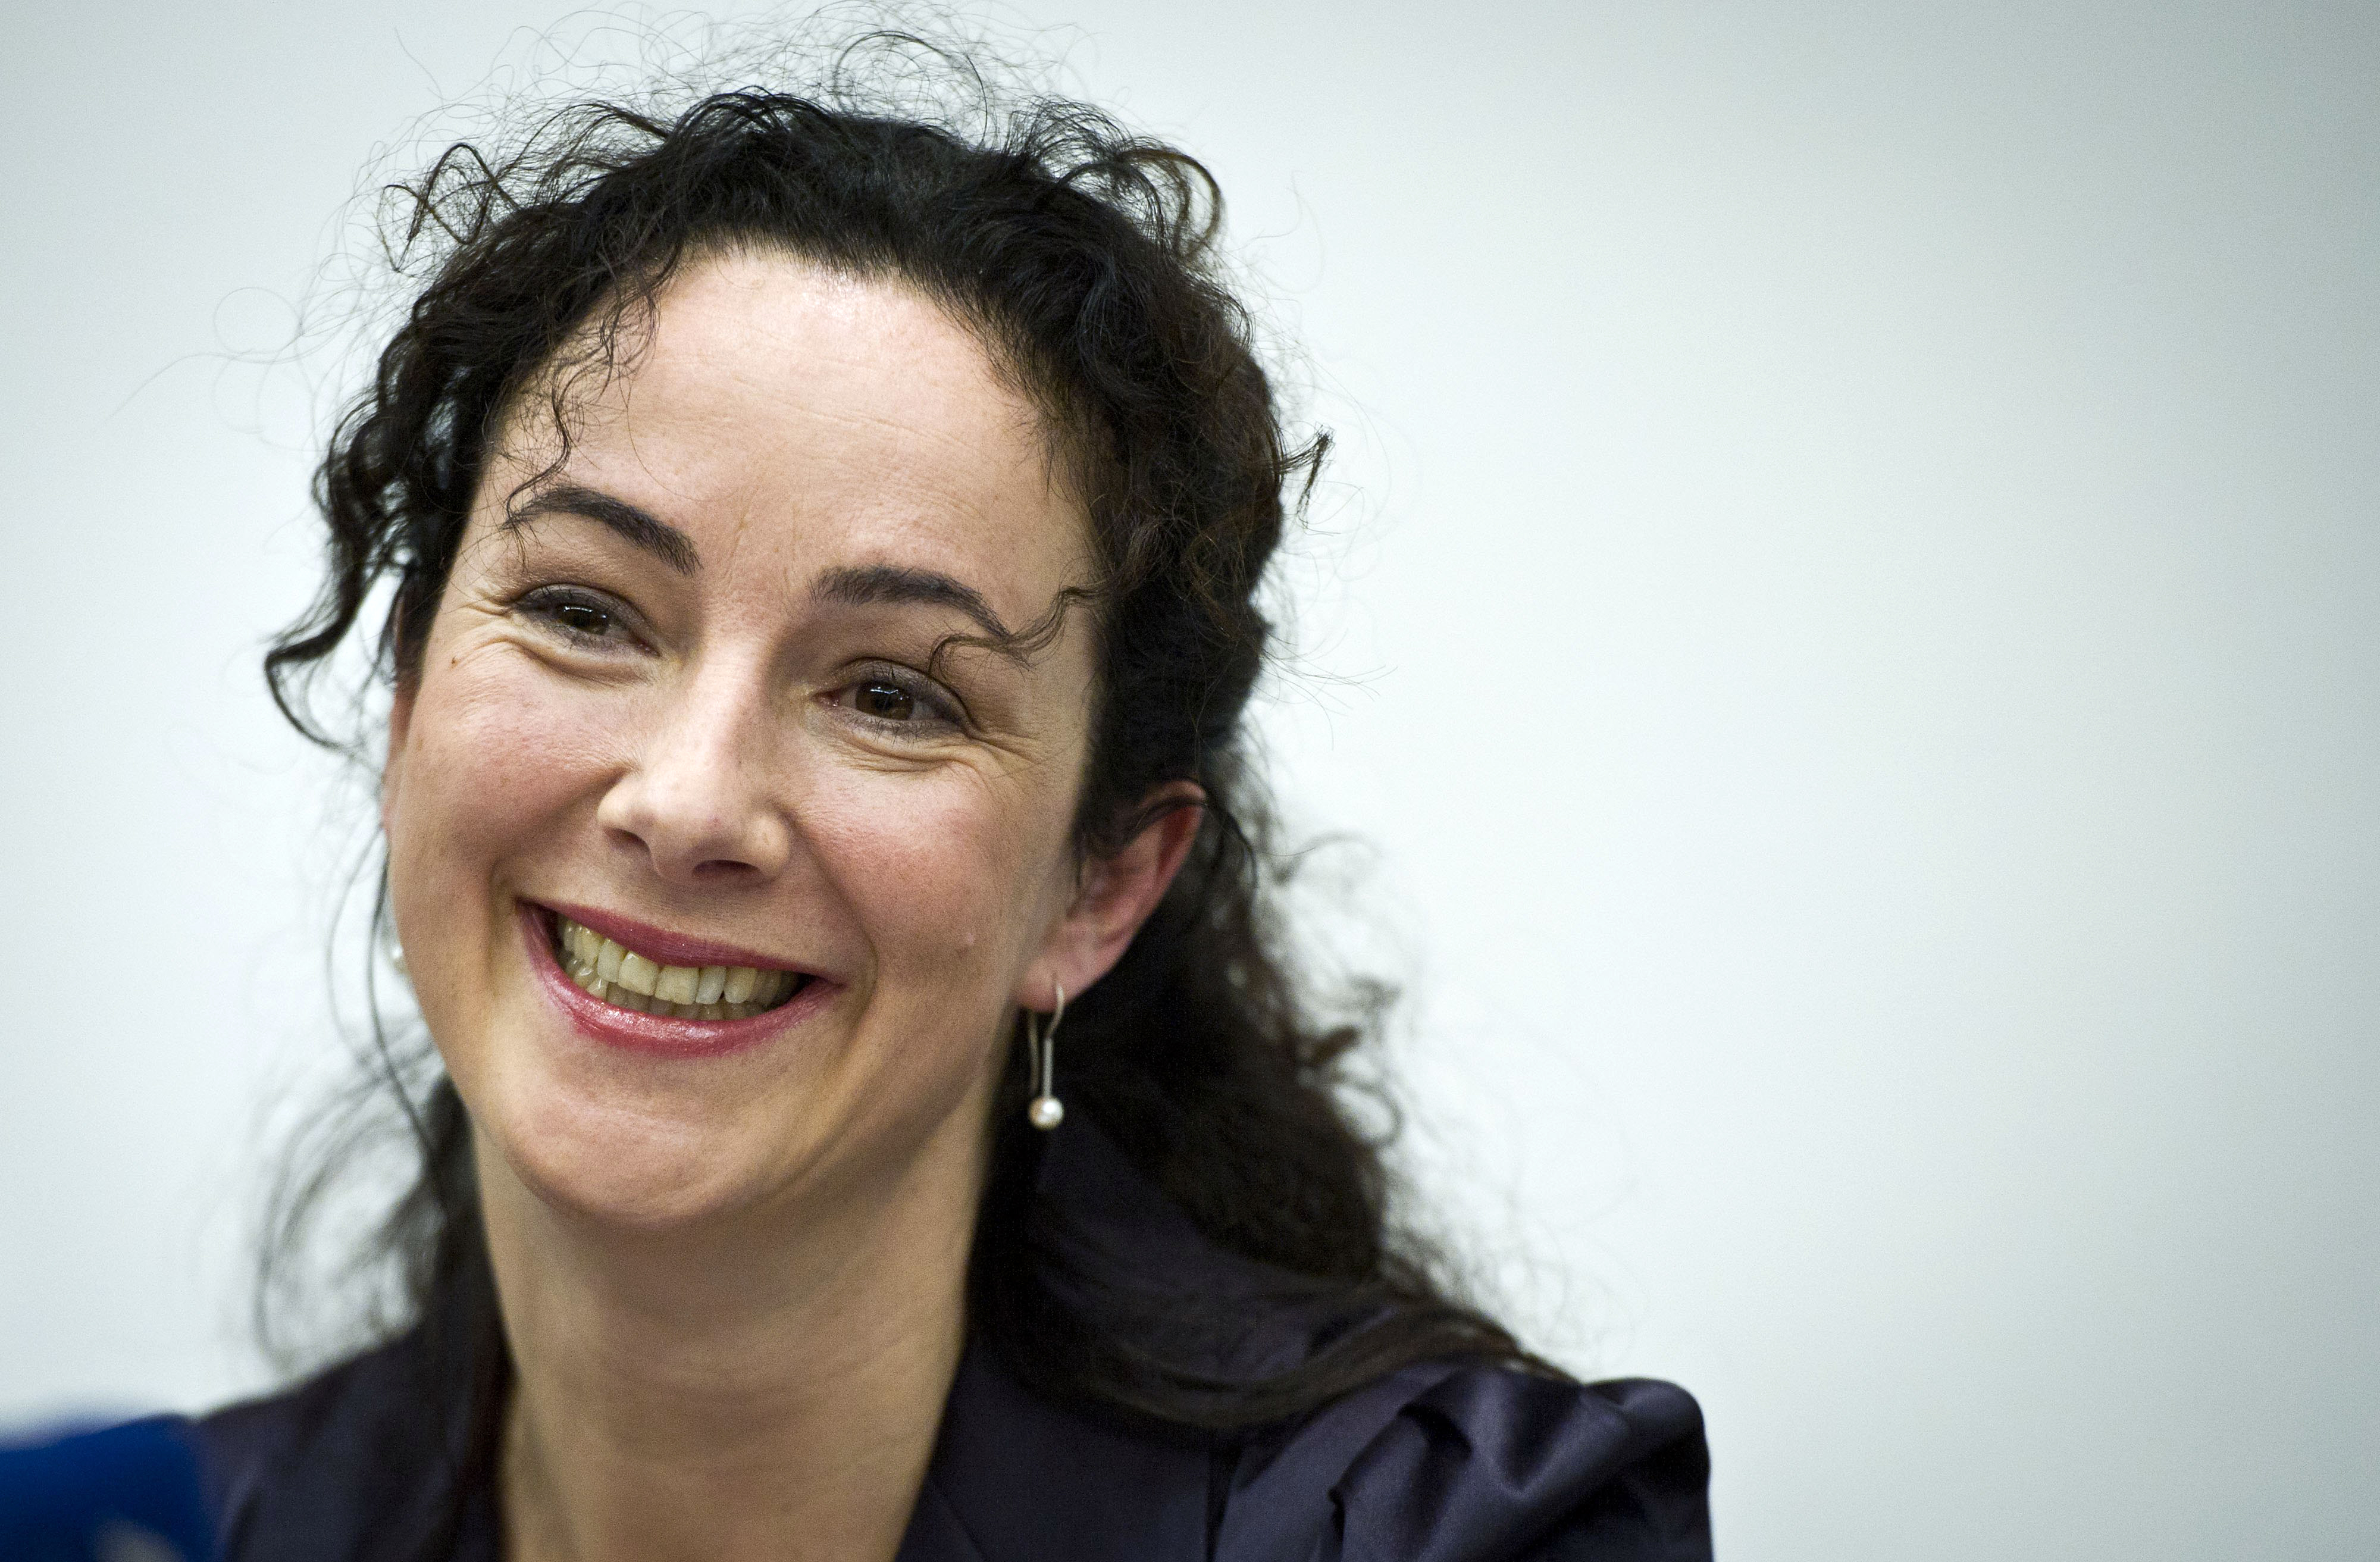 Femke Halsema, leader of the Dutch left-